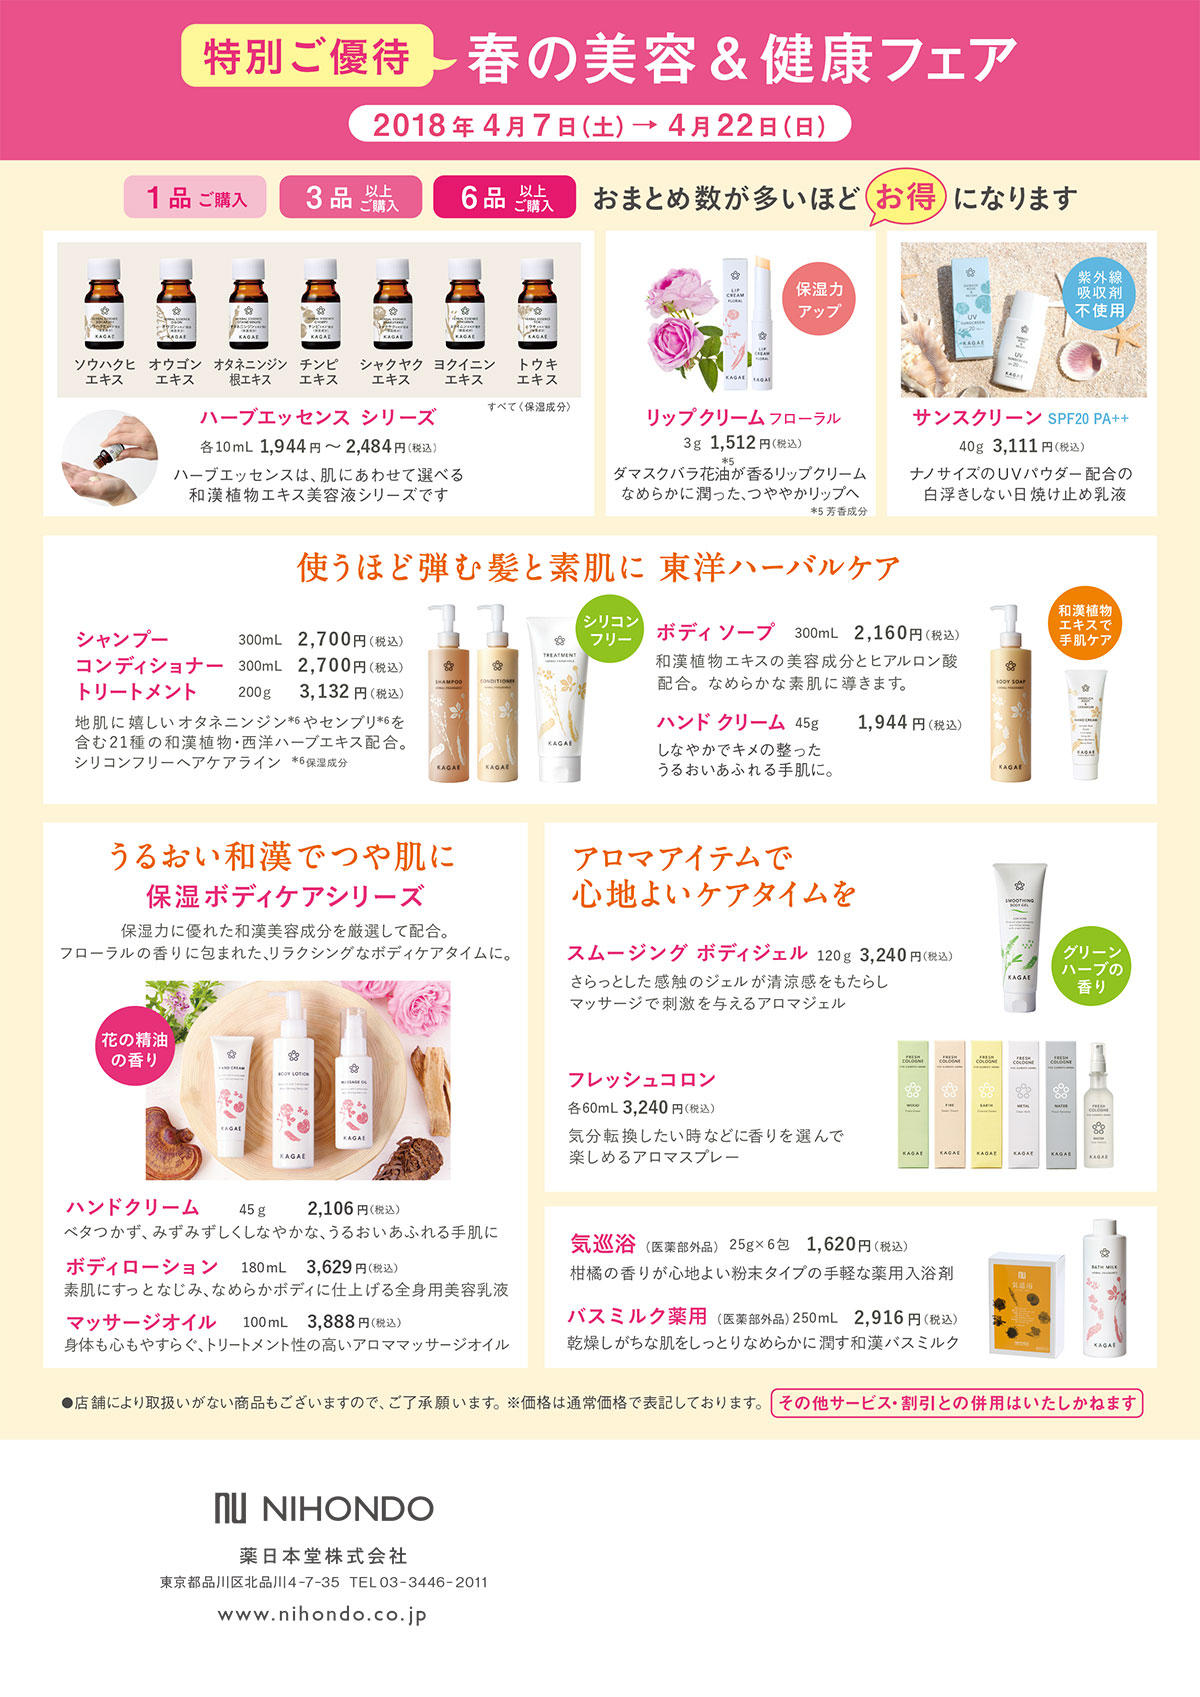 https://www.odori-bisse.com/info/nihondoh_180404_img02.jpg